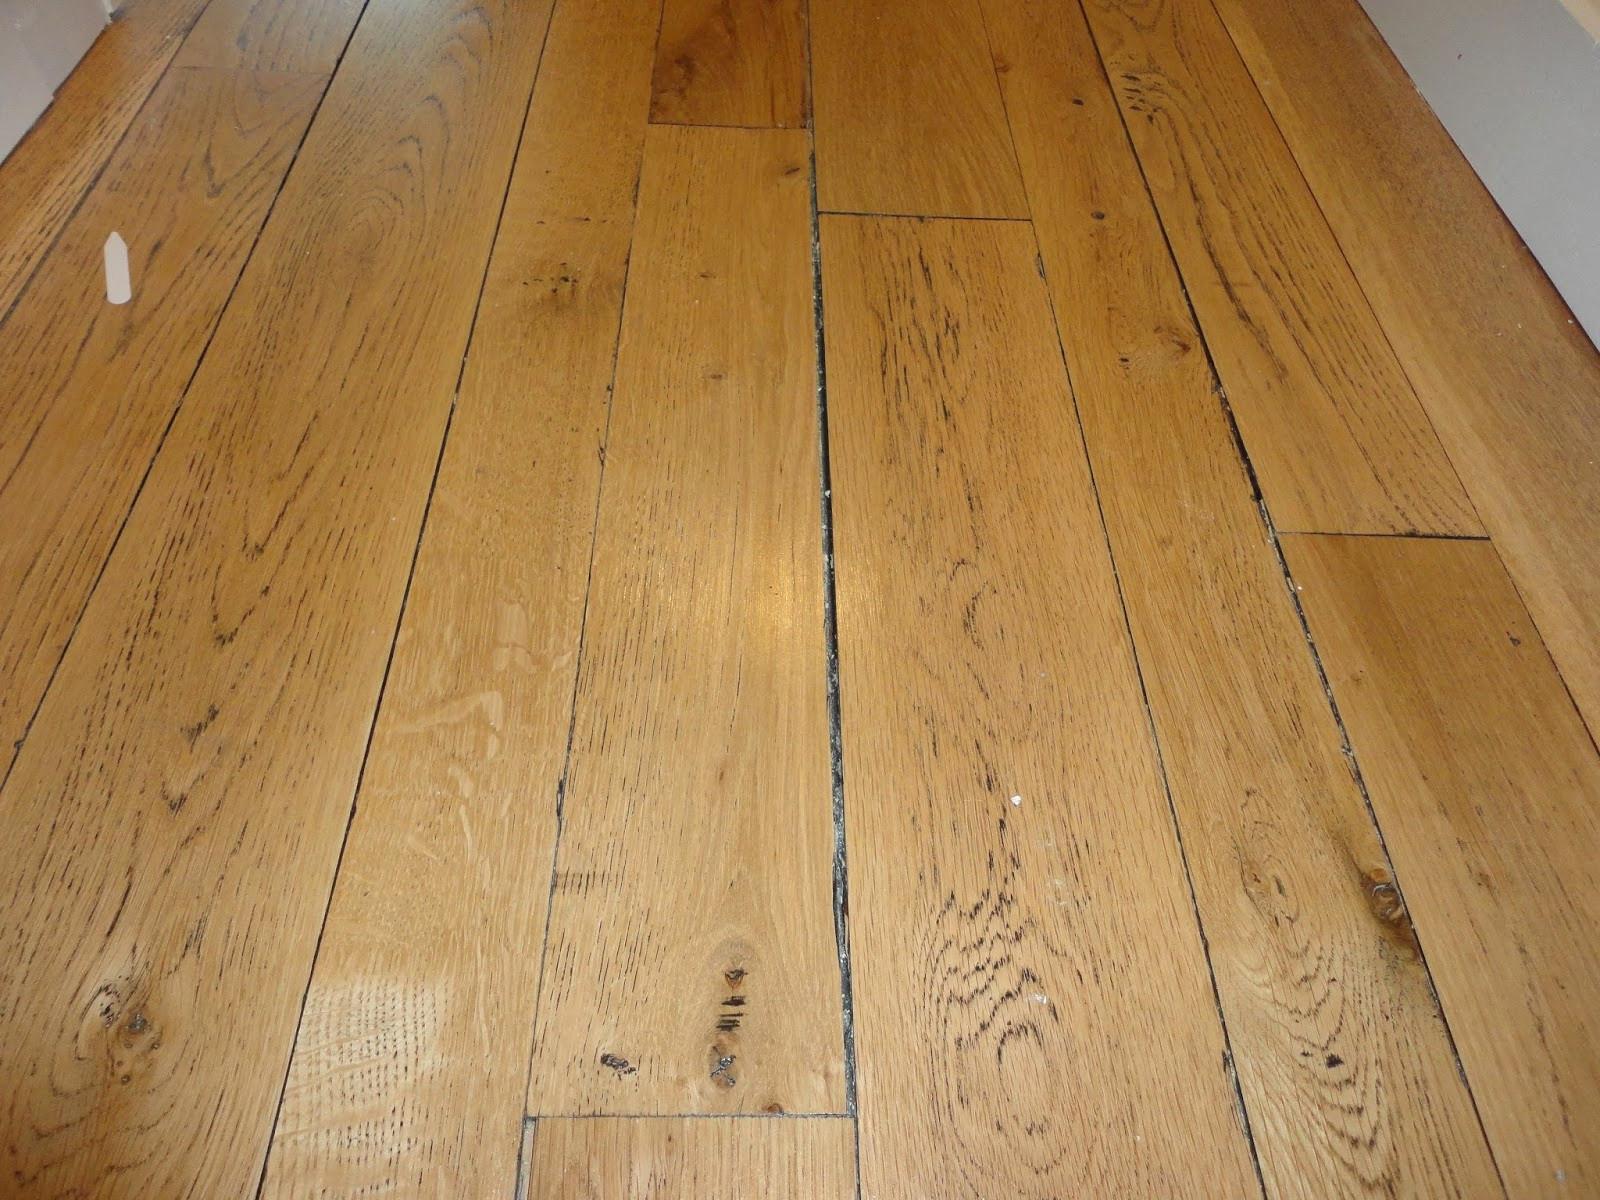 29 Famous Lm Engineered Hardwood Flooring Reviews 2021 free download lm engineered hardwood flooring reviews of white washed engineered wood flooring can you whitewash engineered for 39 beautiful white wash wood floors home idea